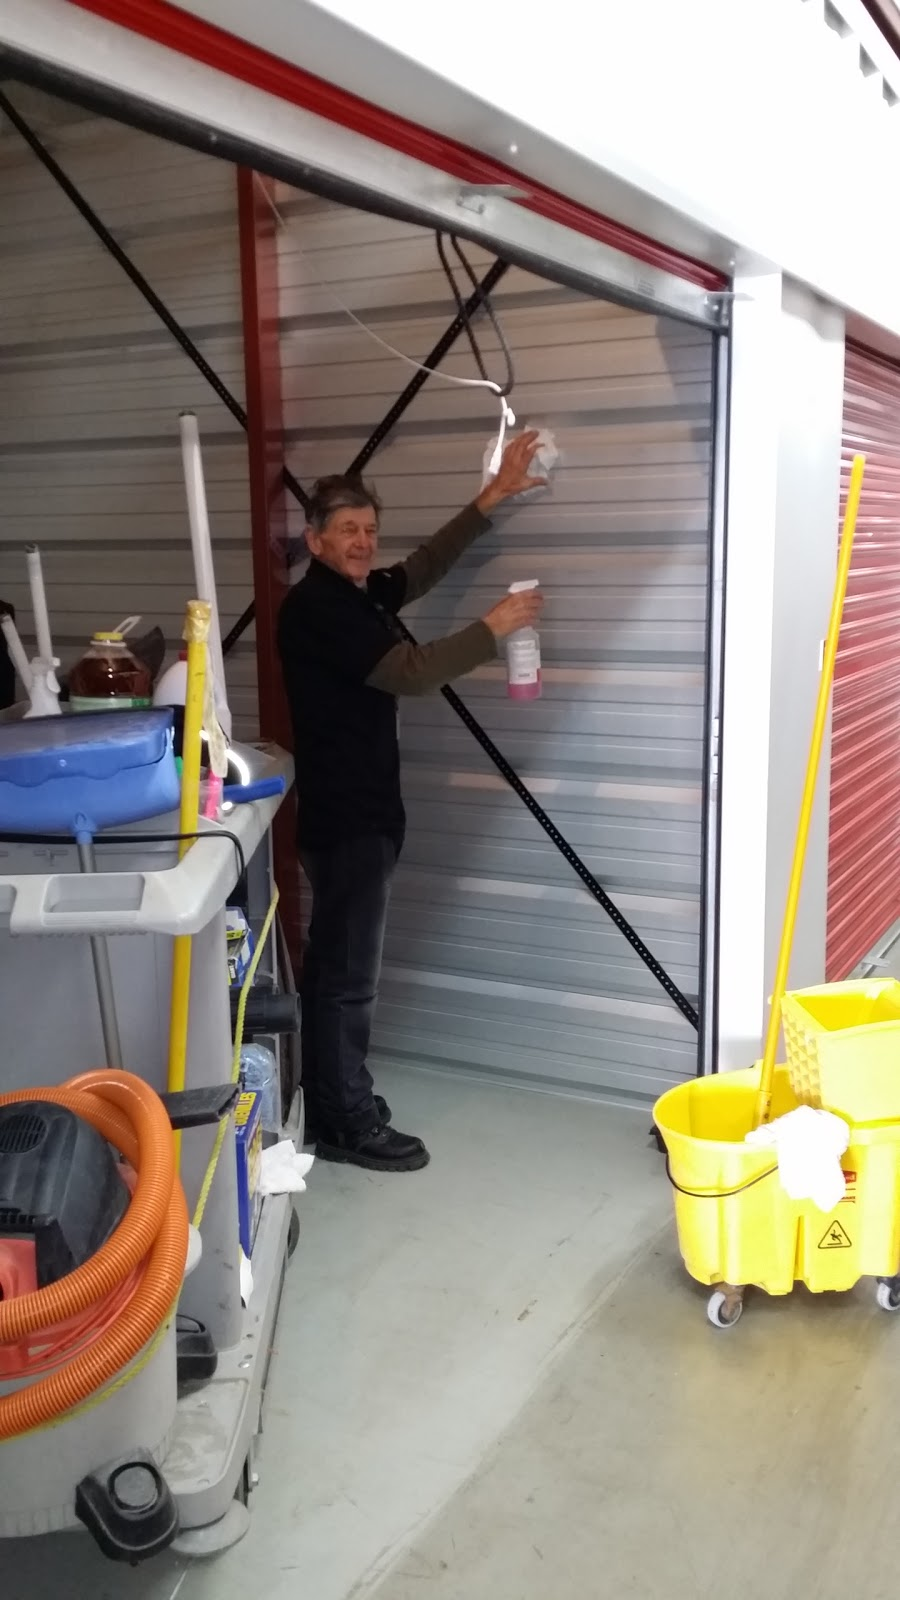 U-Haul Moving & Storage Of Abbotsford | storage | 33966 Hazelwood Ave RR3, Abbotsford, BC V2S 7V2, Canada | 6048596095 OR +1 604-859-6095